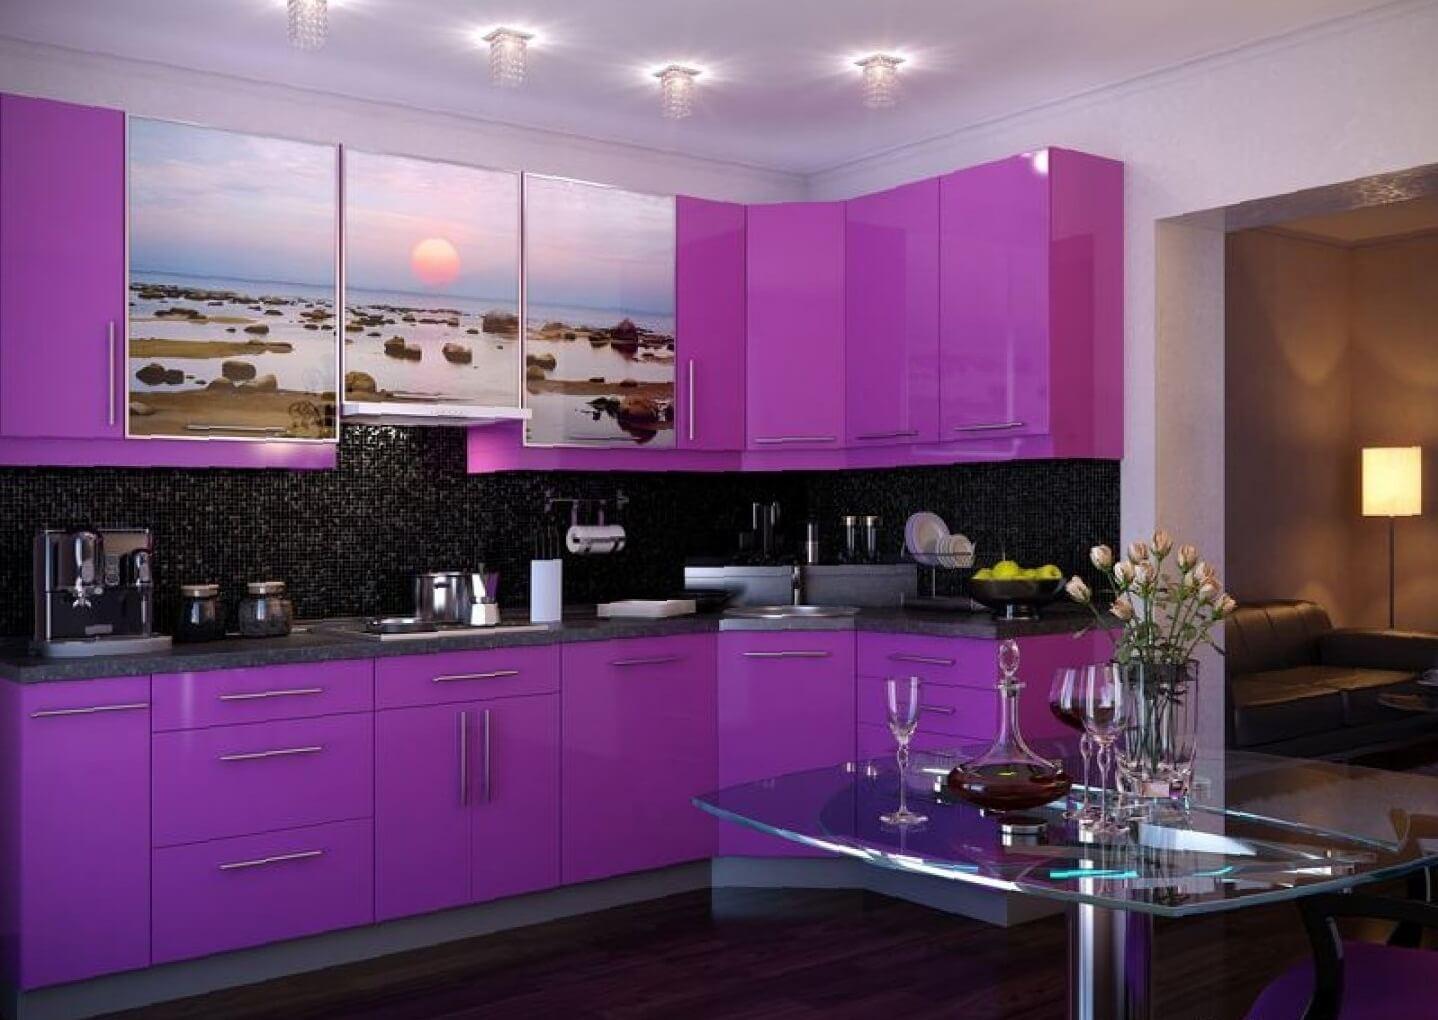 dekorasi kabinet dapur warna ungu yang unik